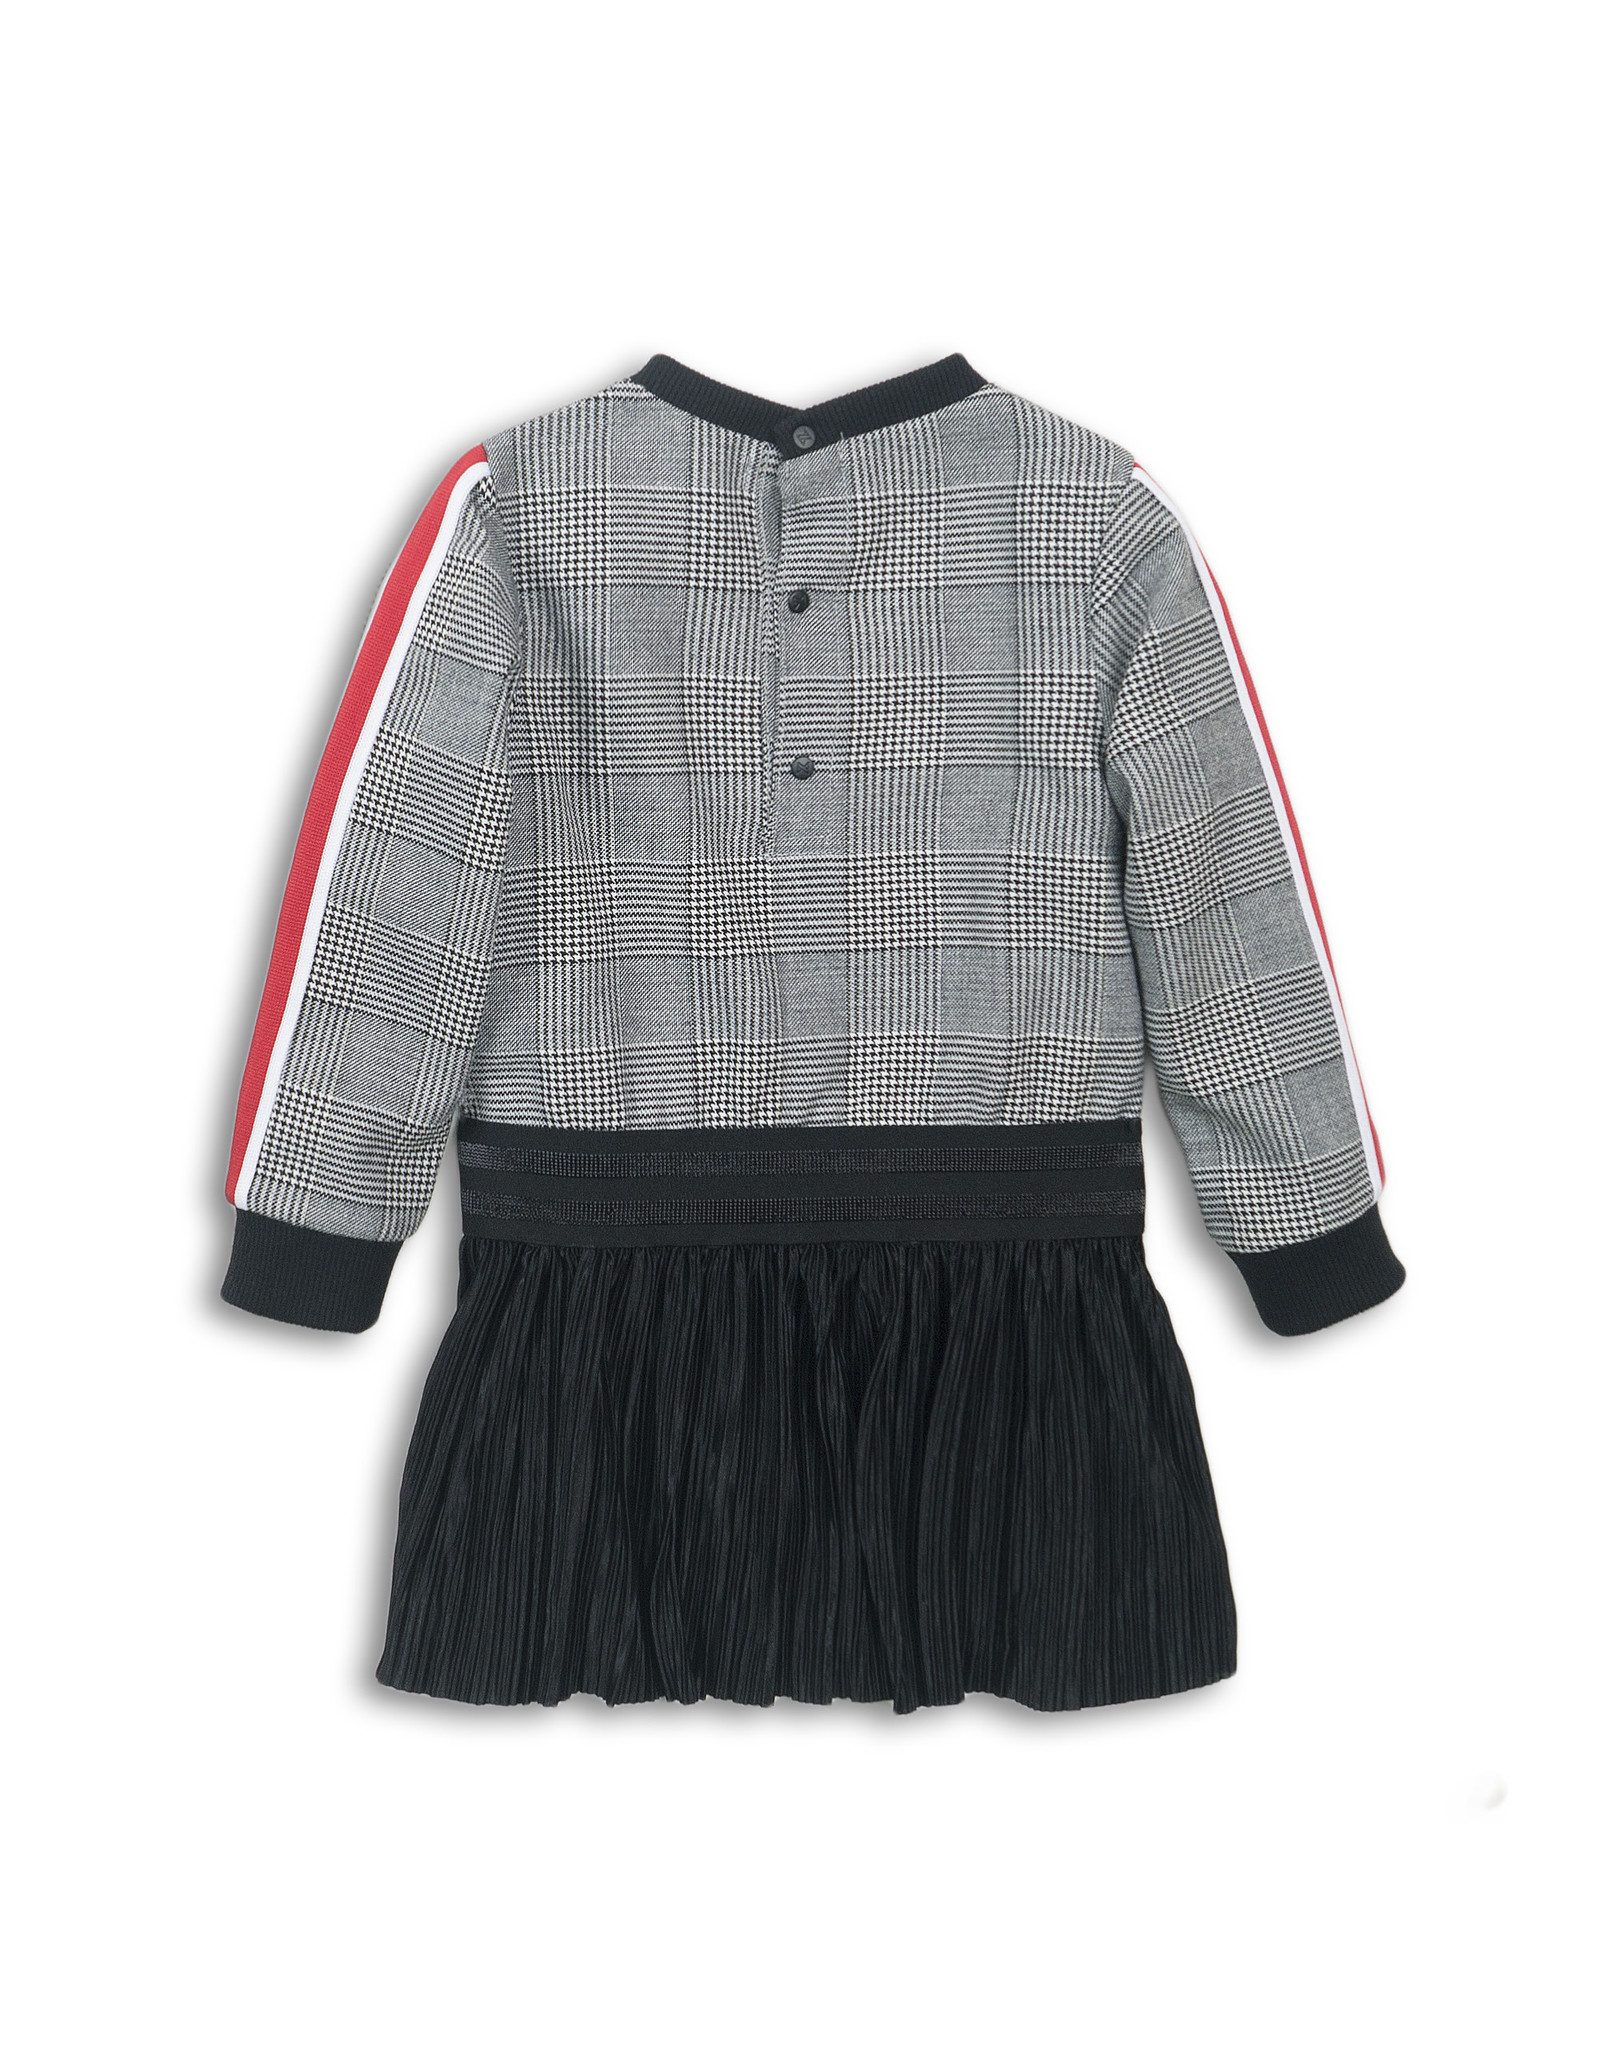 KOKO NOKO jurk